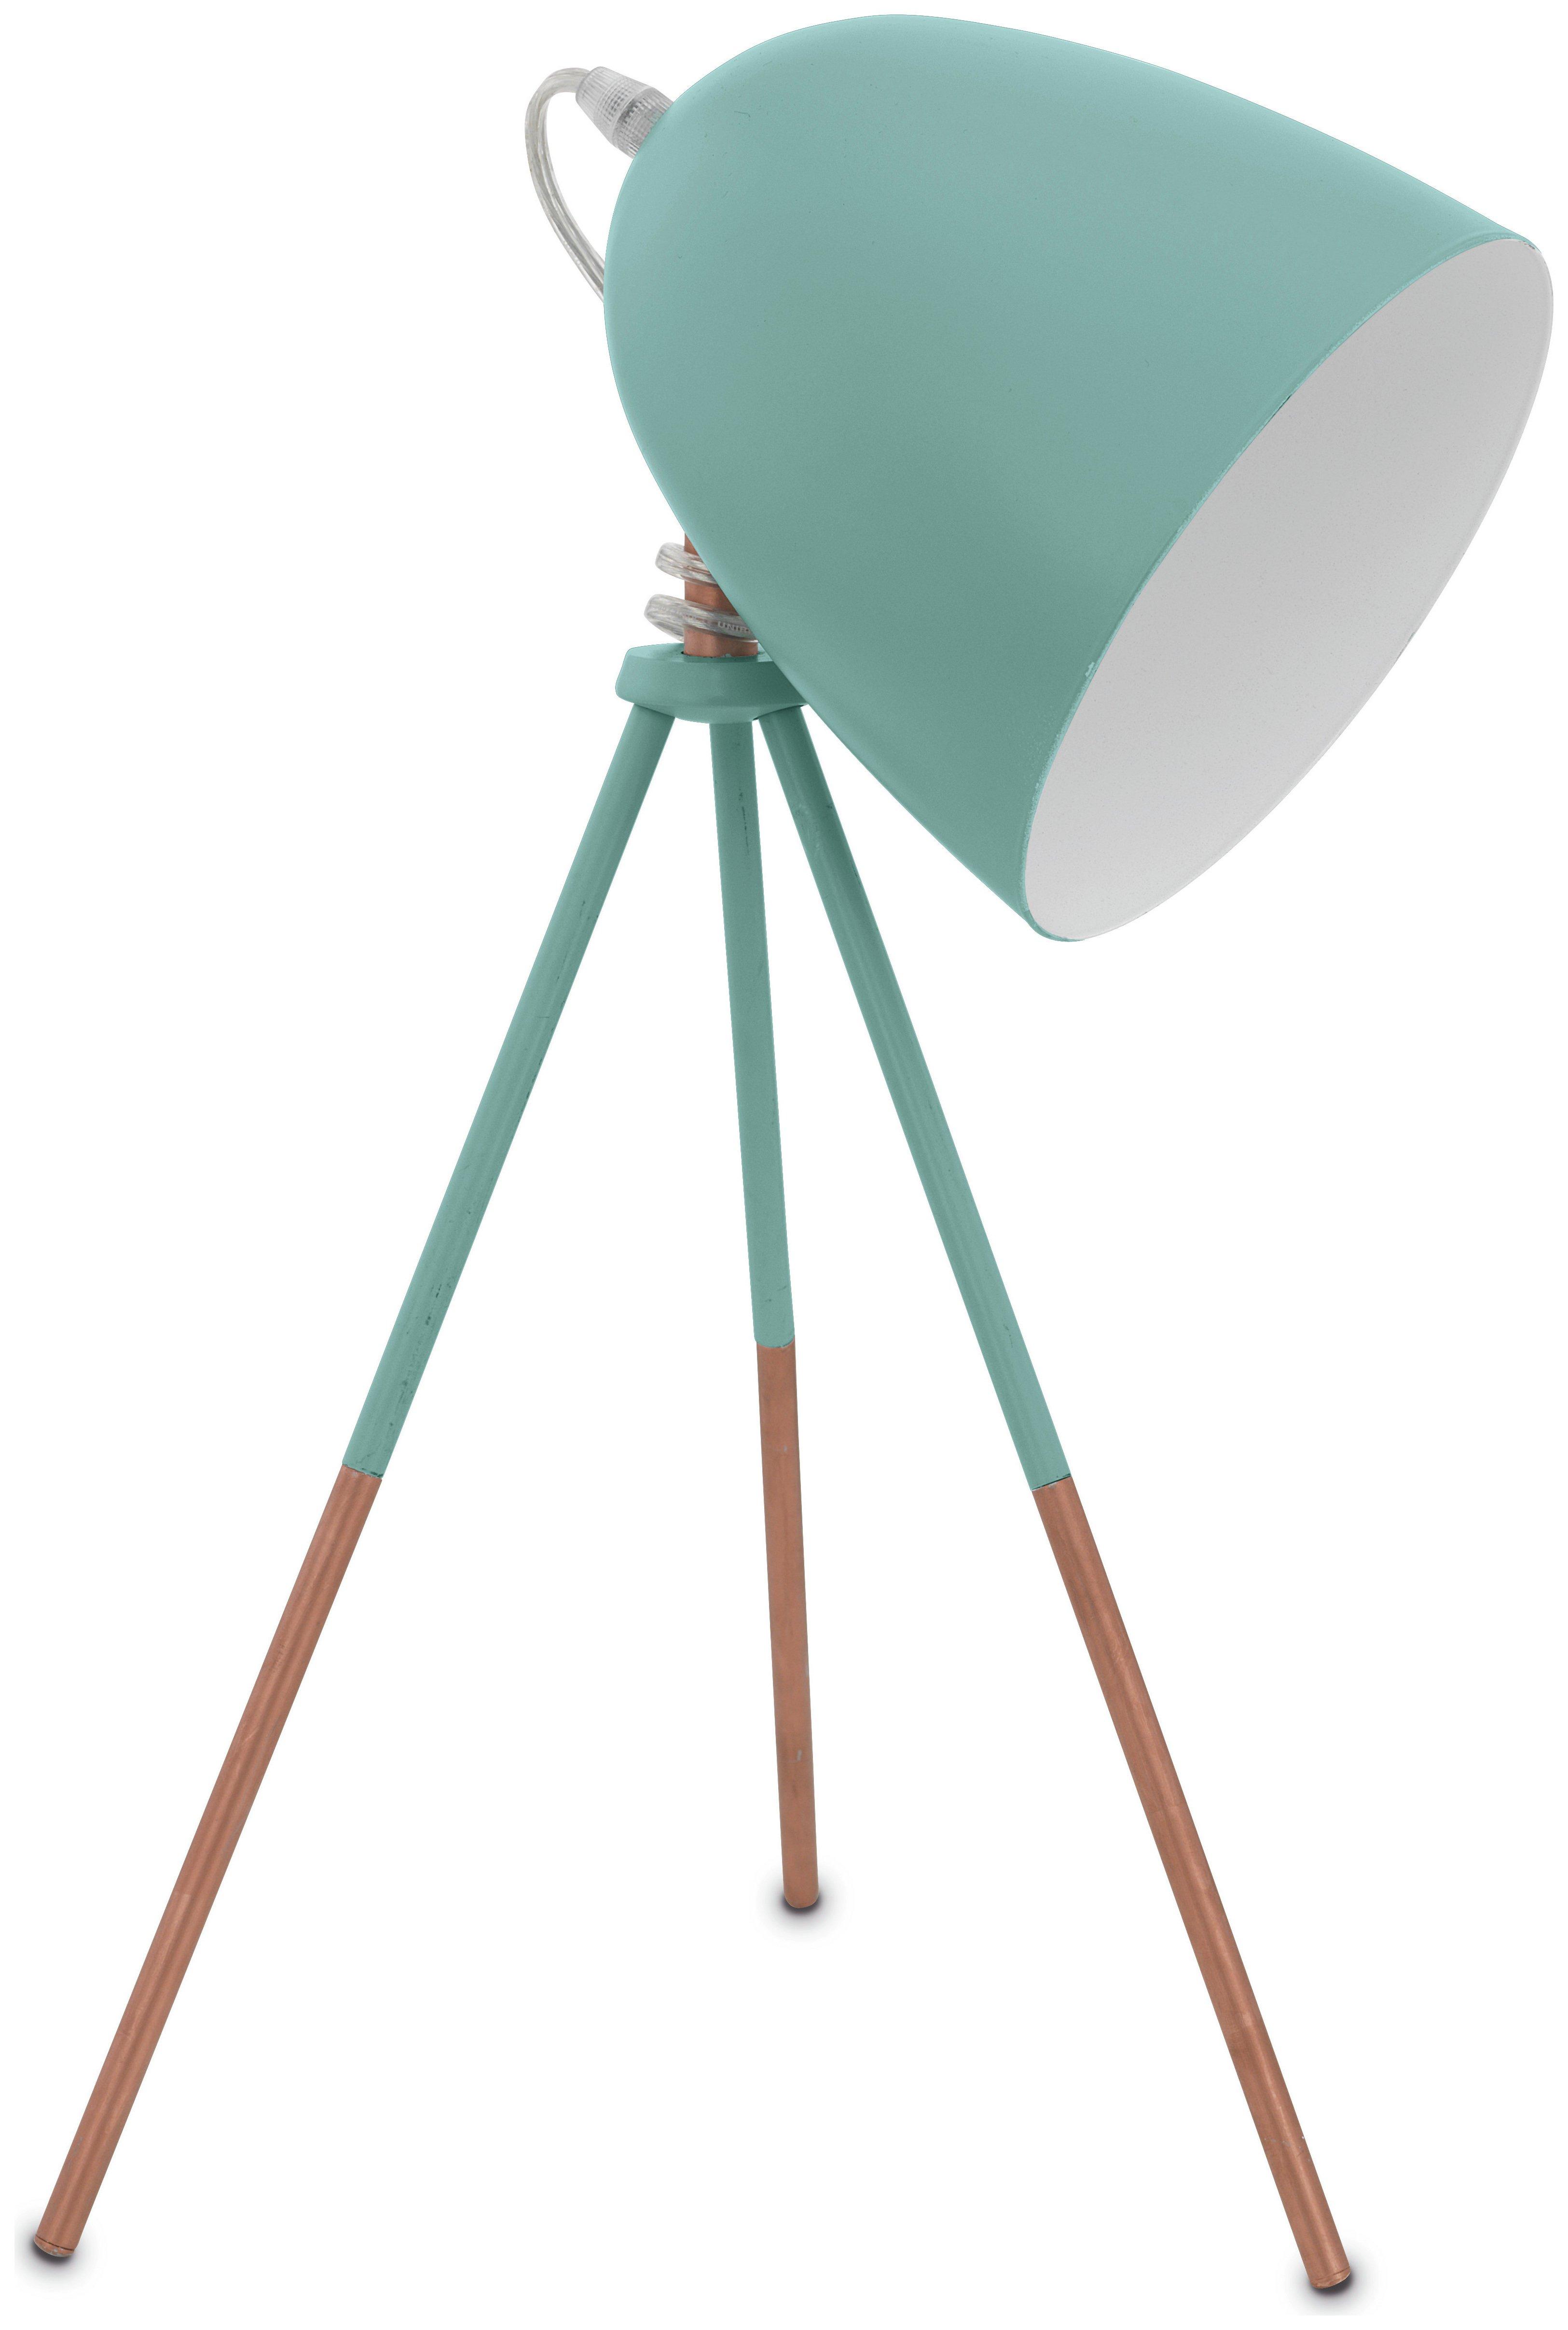 Image of Eglo Carlton Vintage Table Lamp - Mint.